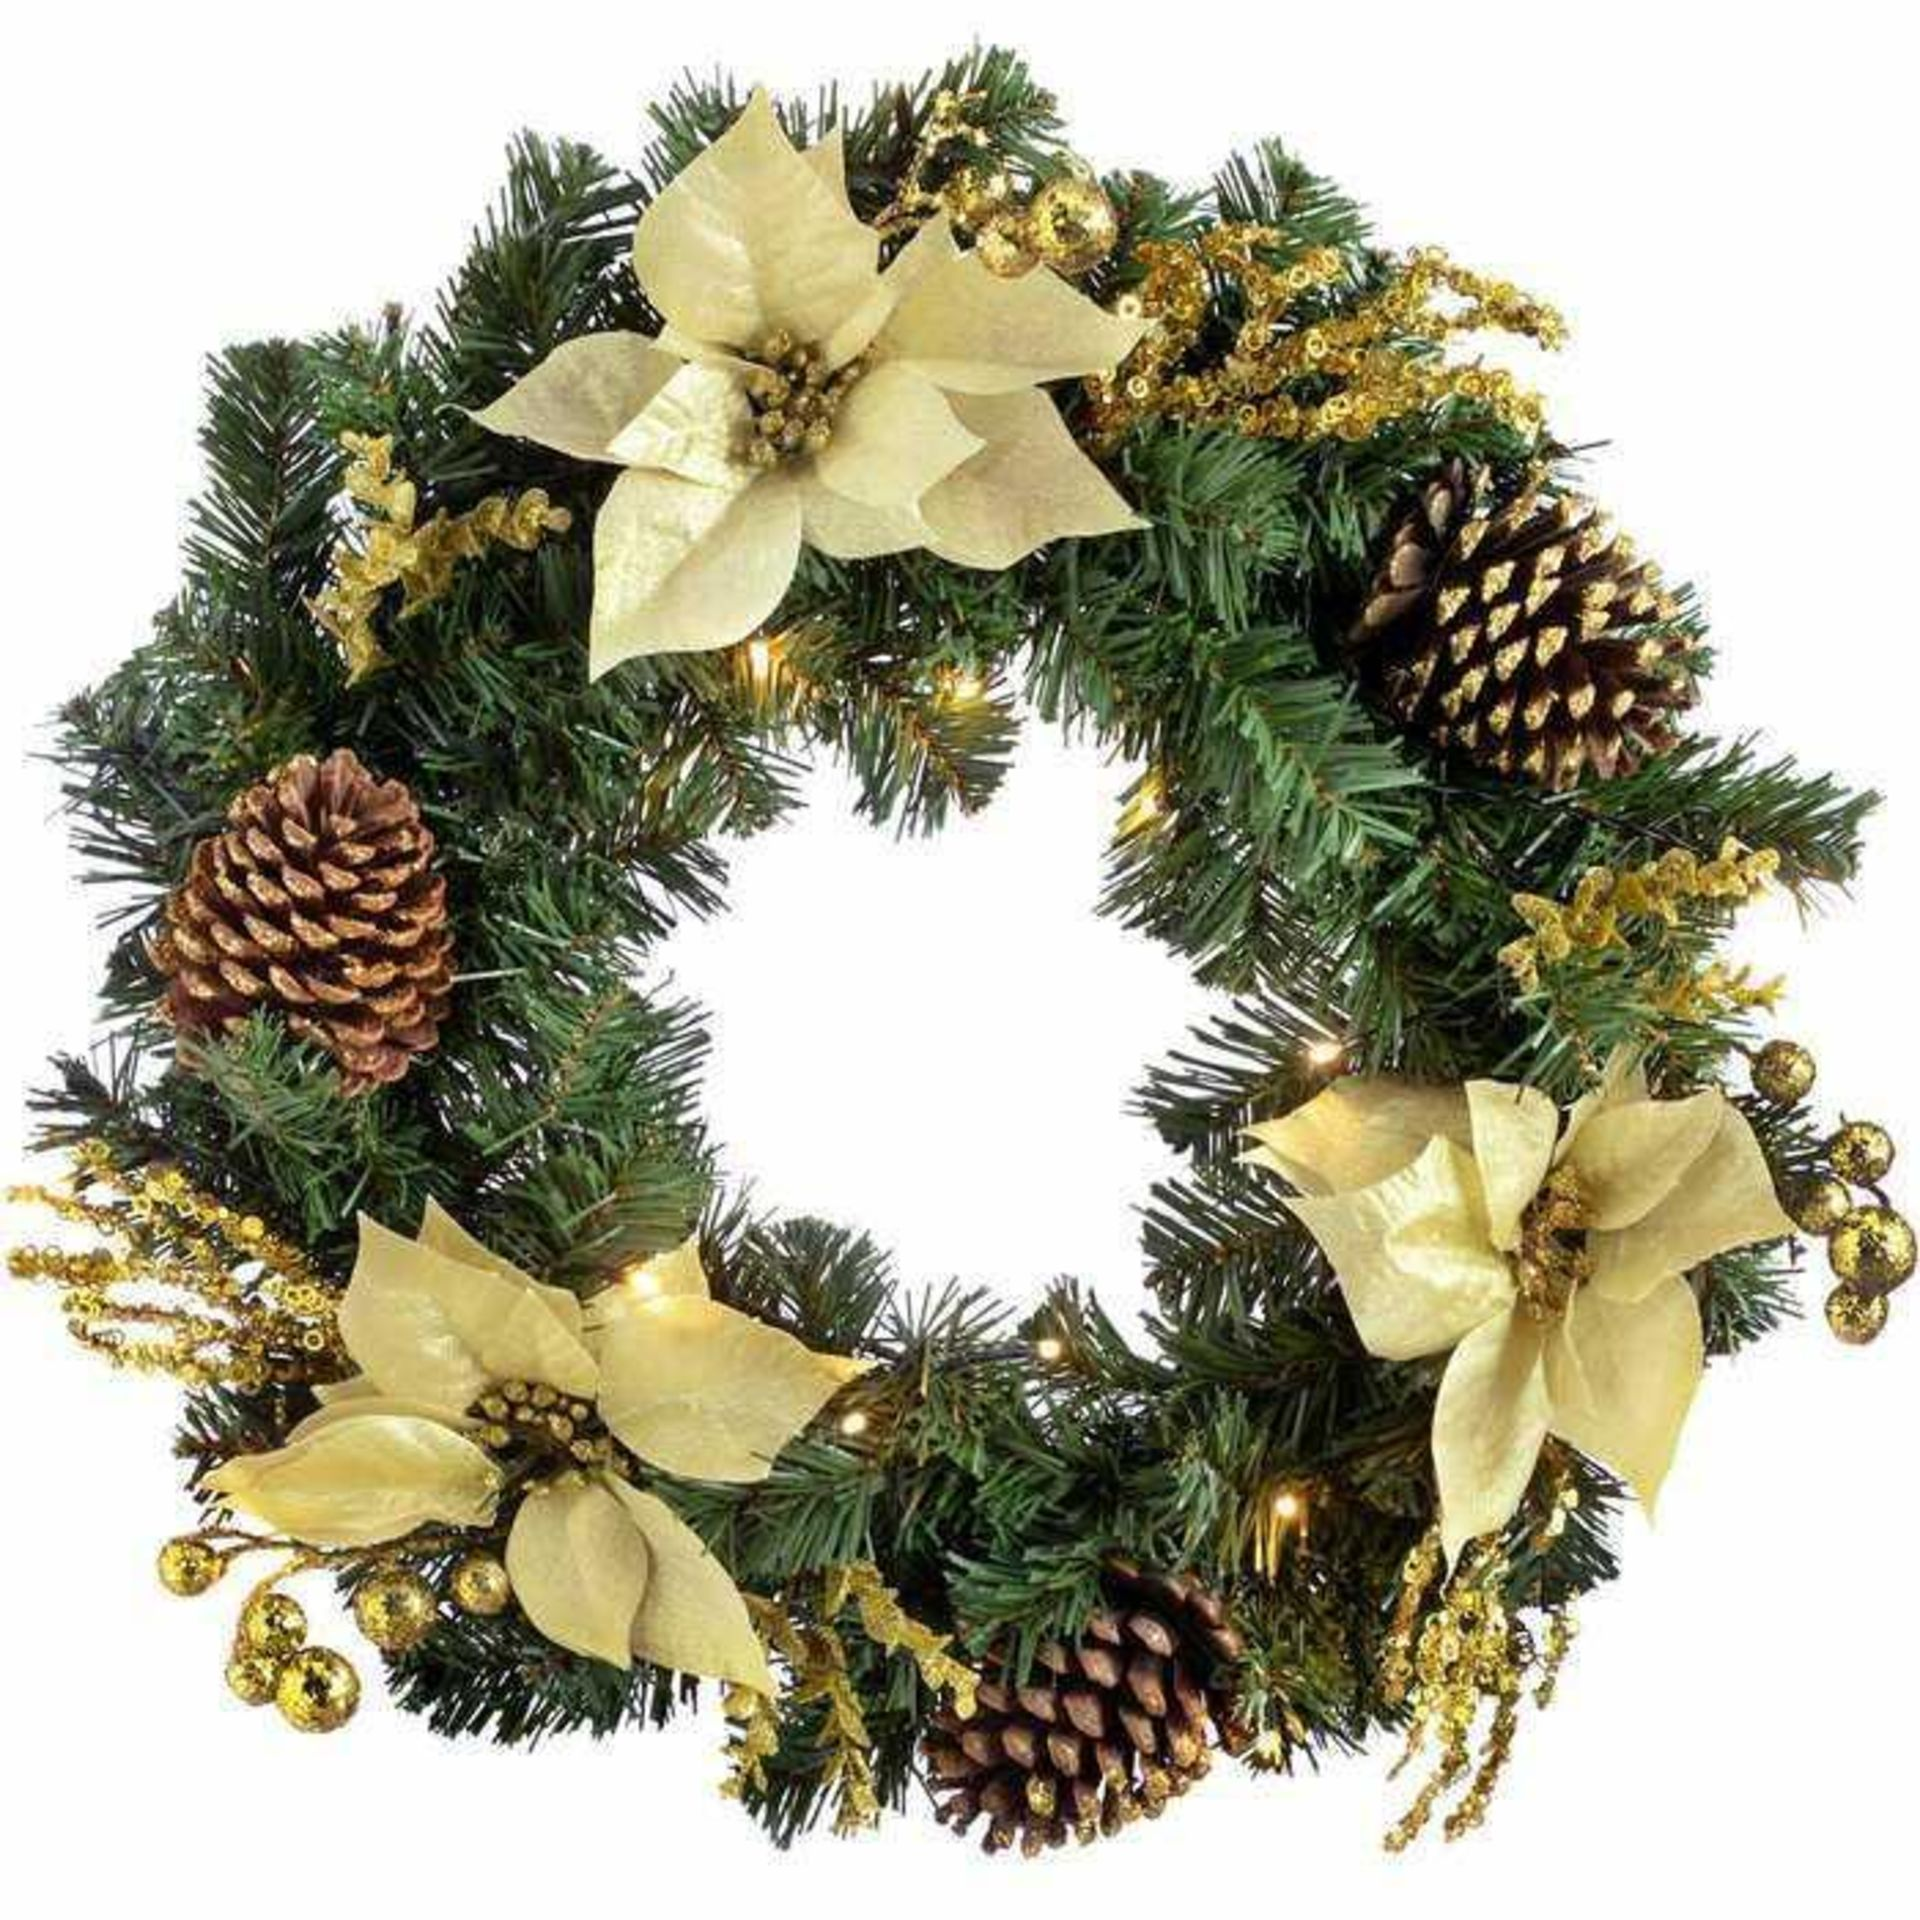 RRP £40 Boxed The Seasonal Aisle Pre Lit Illuminated 60Cm Christmas Wreath (10420)